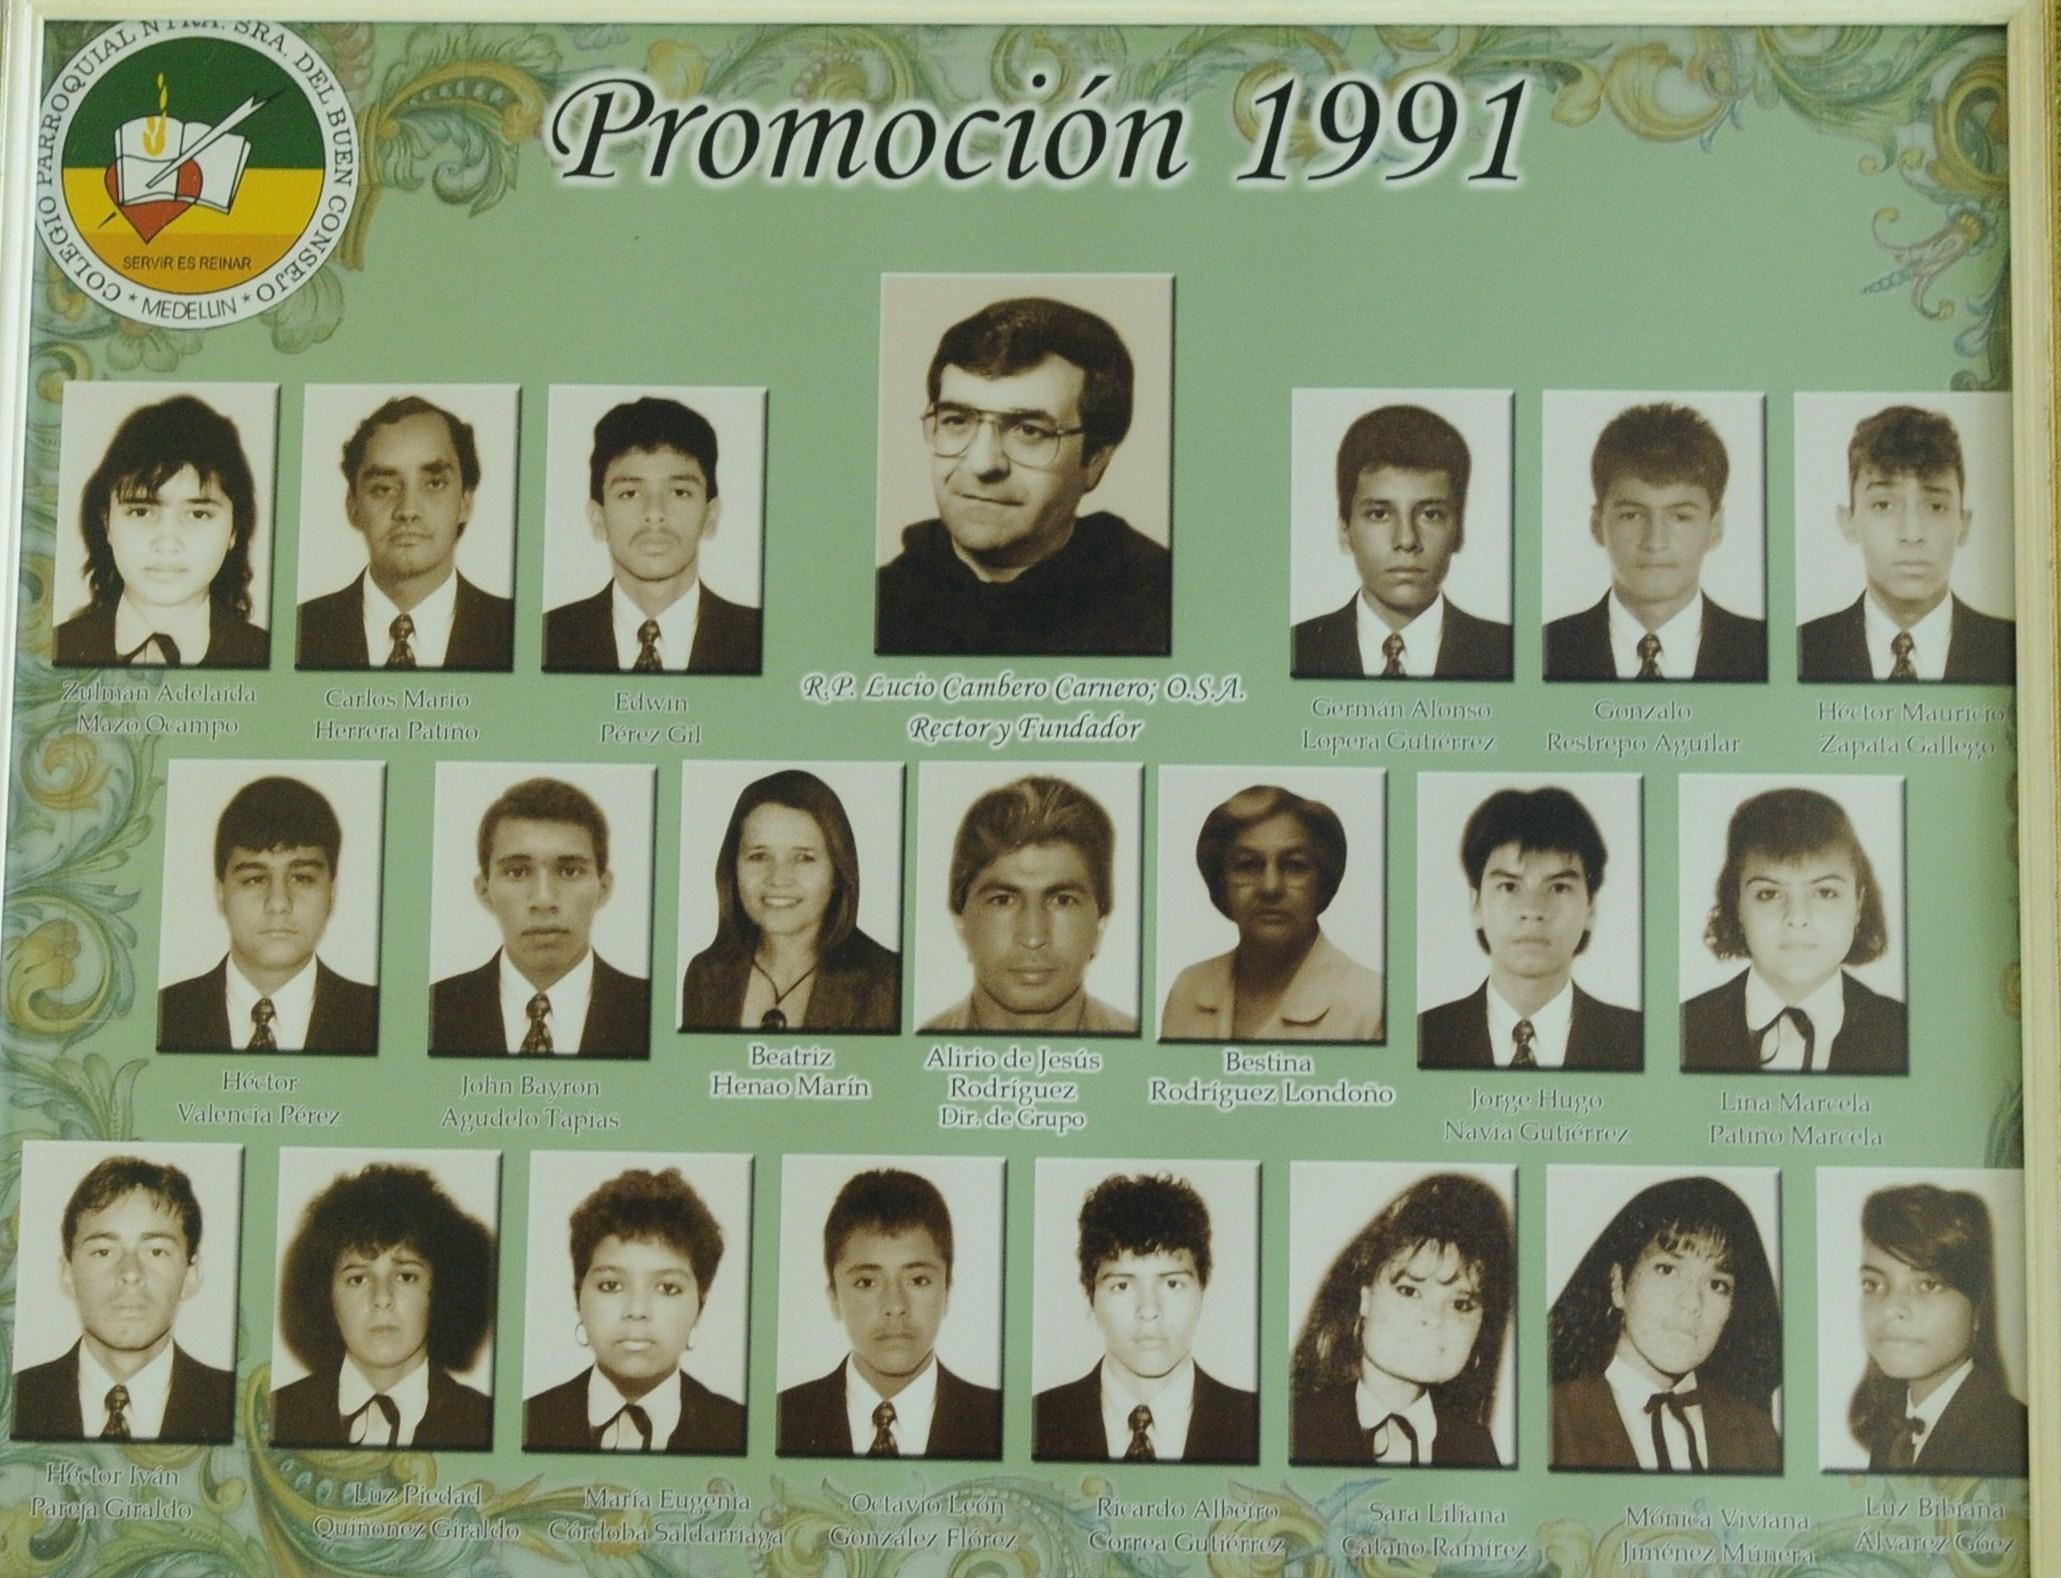 PILARES 1991